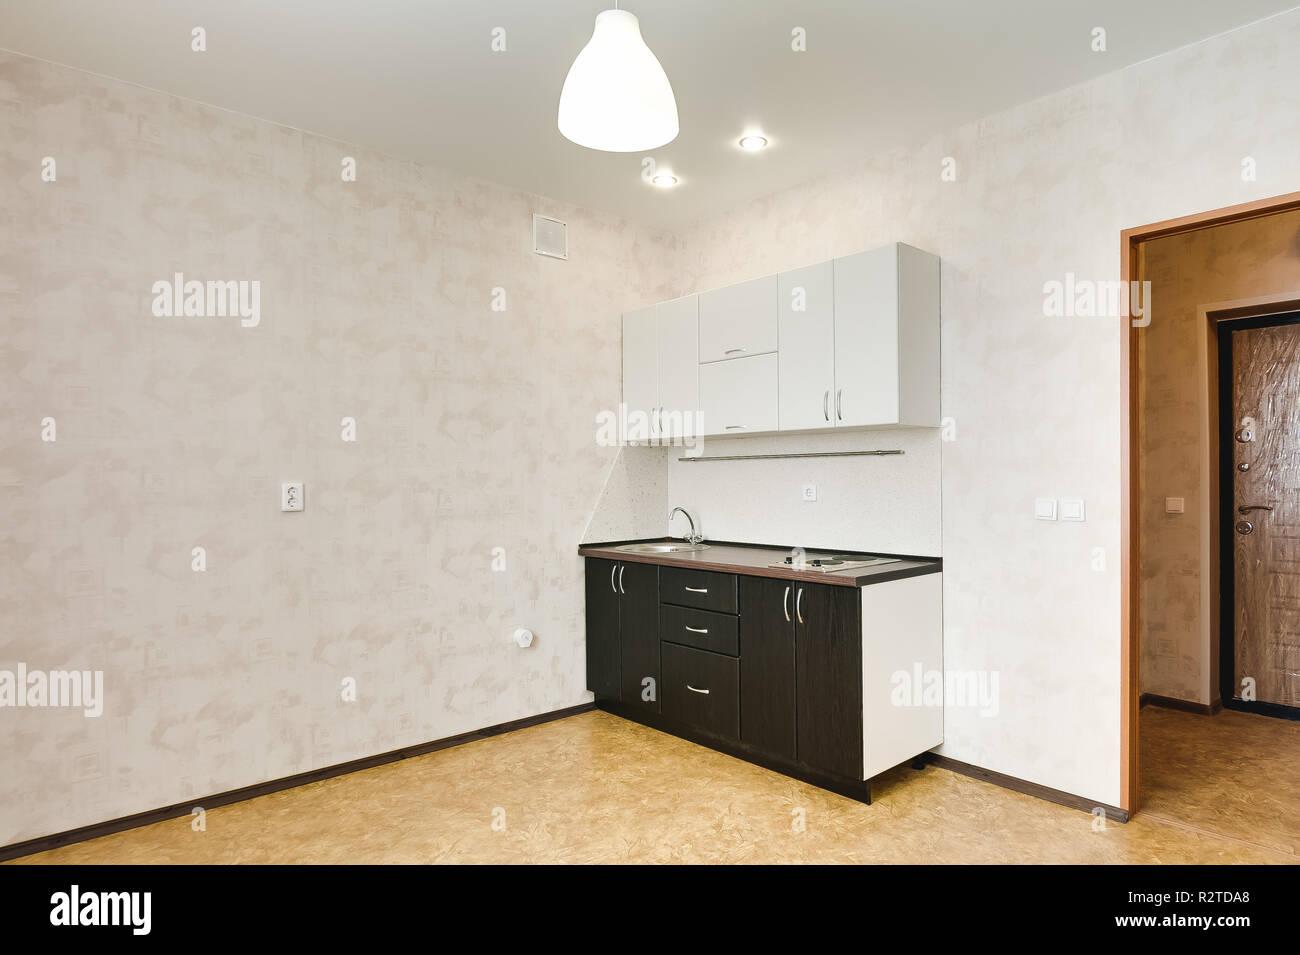 Interior In A Small Studio Apartment Kitchen Set Repair In